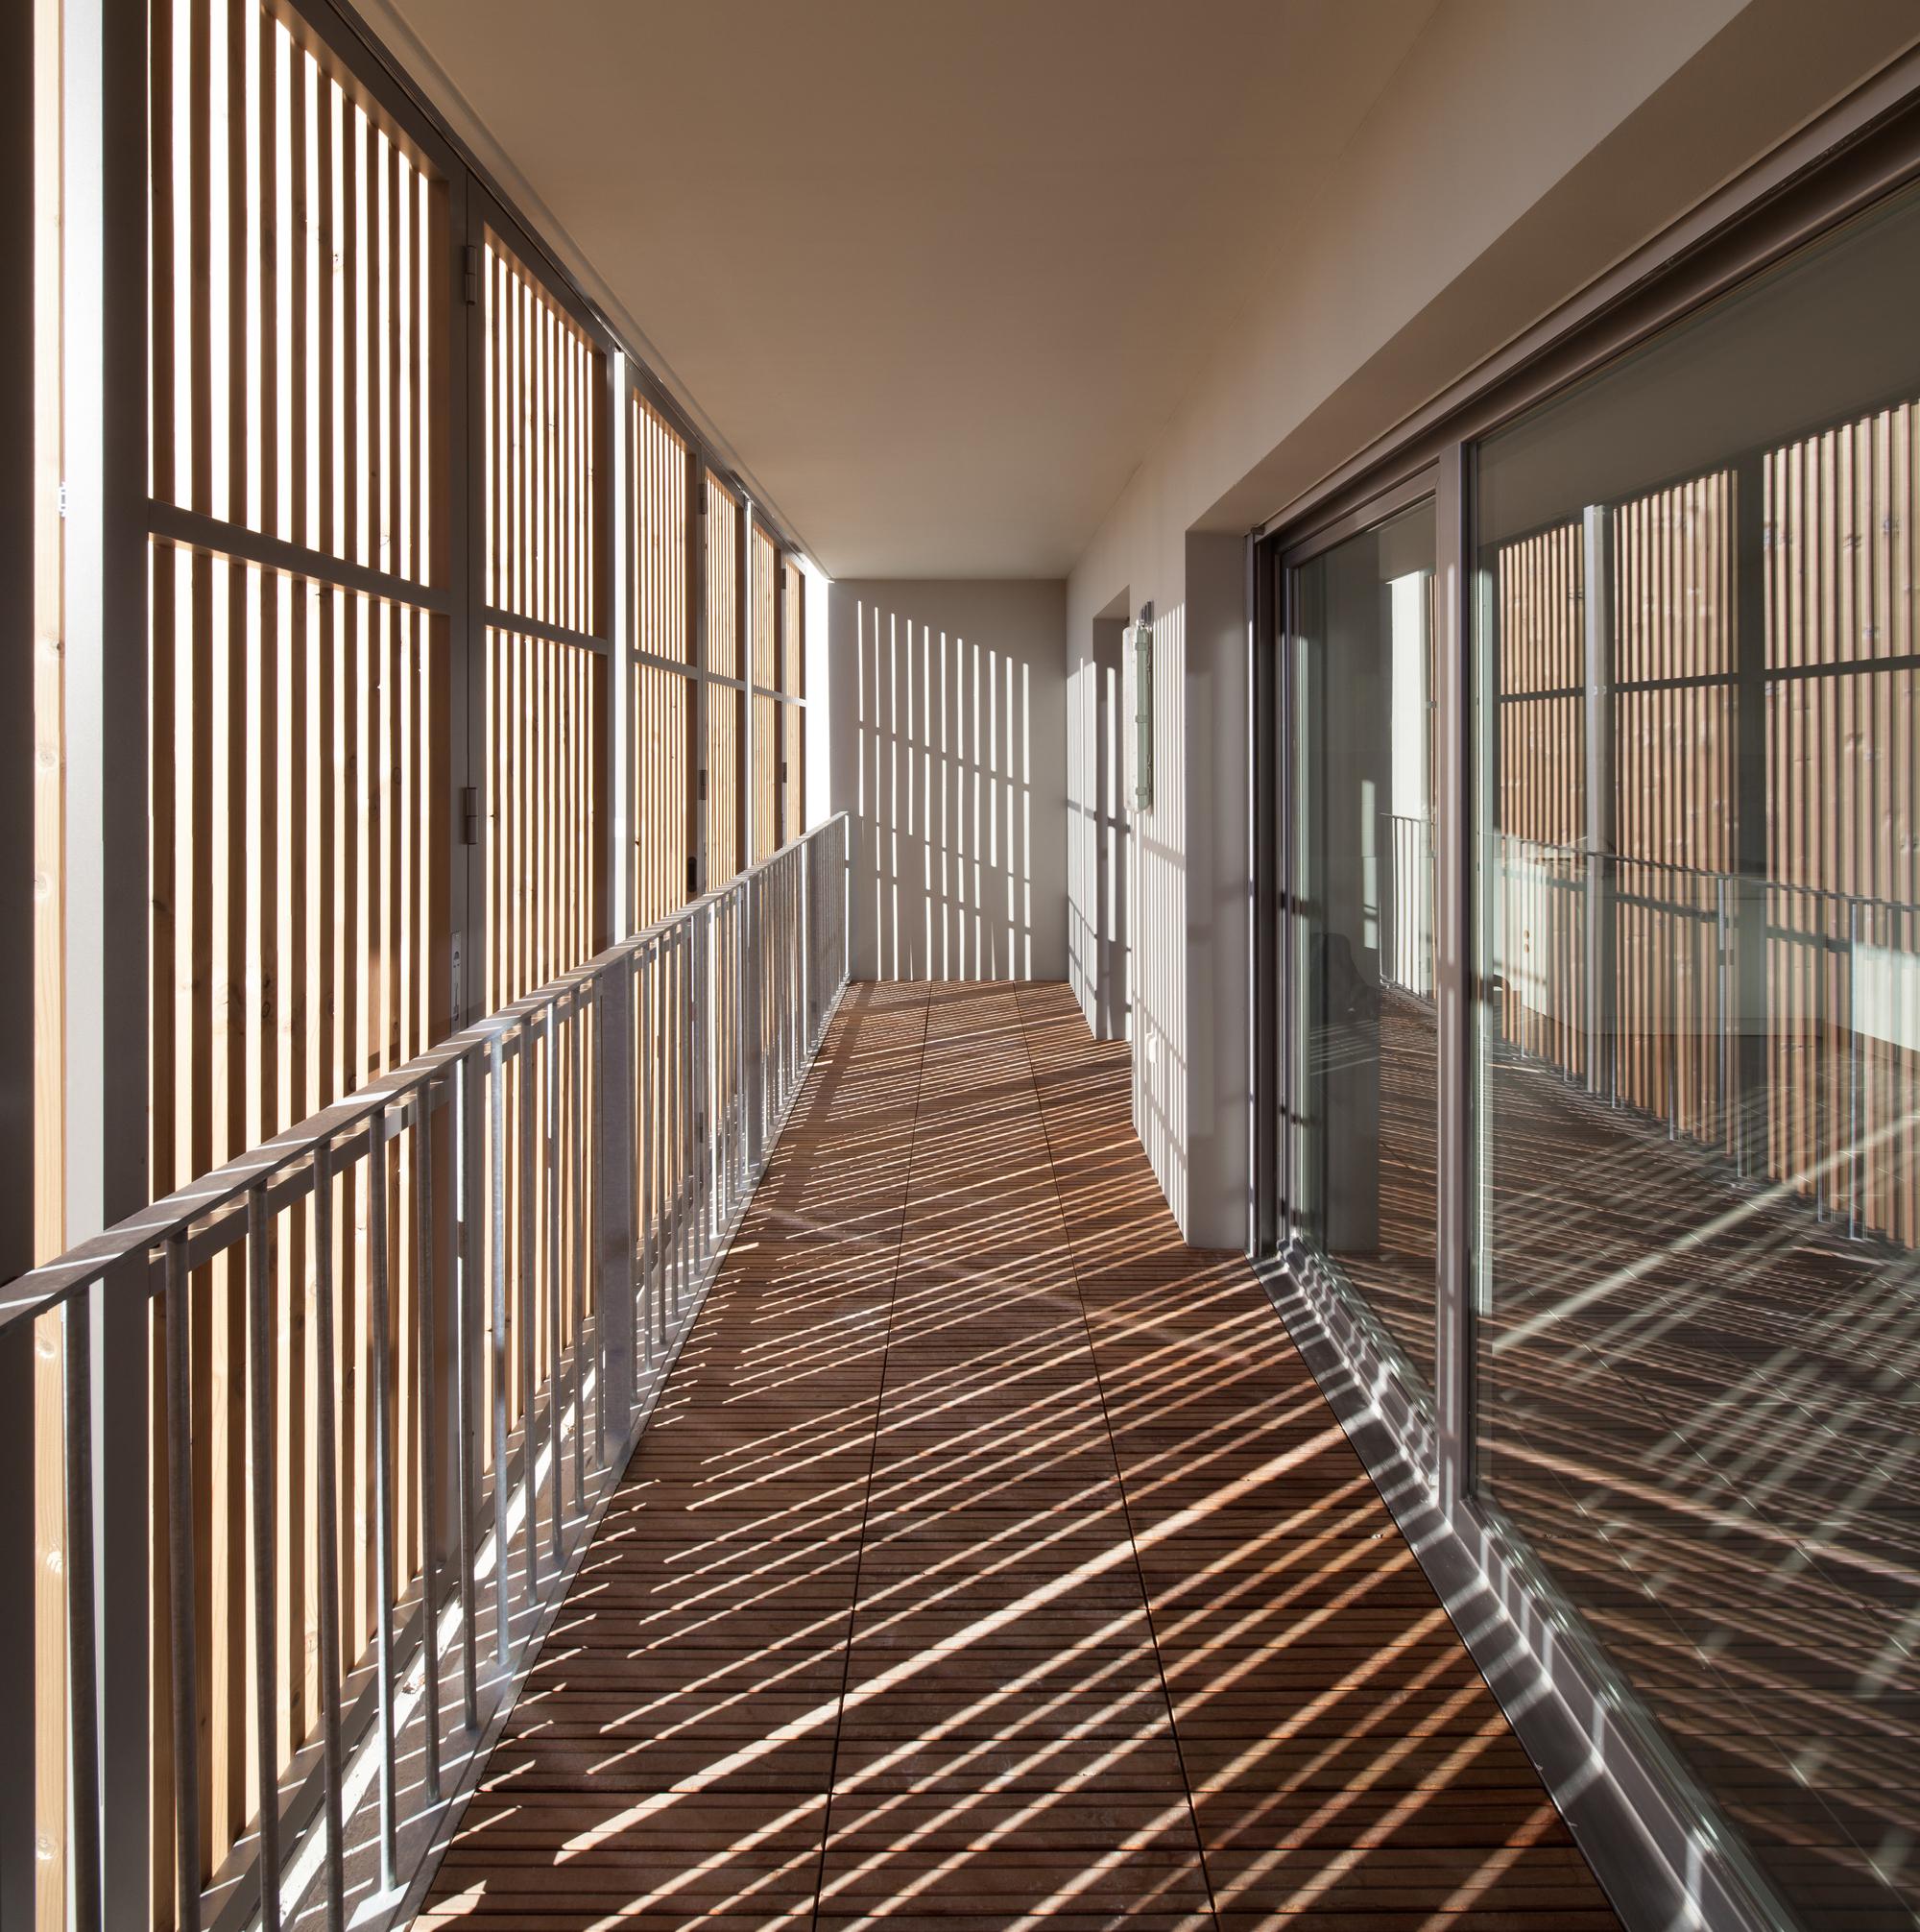 galer a de vivienda social tiendas en mouans sartoux comte et vollenweider architectes 21. Black Bedroom Furniture Sets. Home Design Ideas